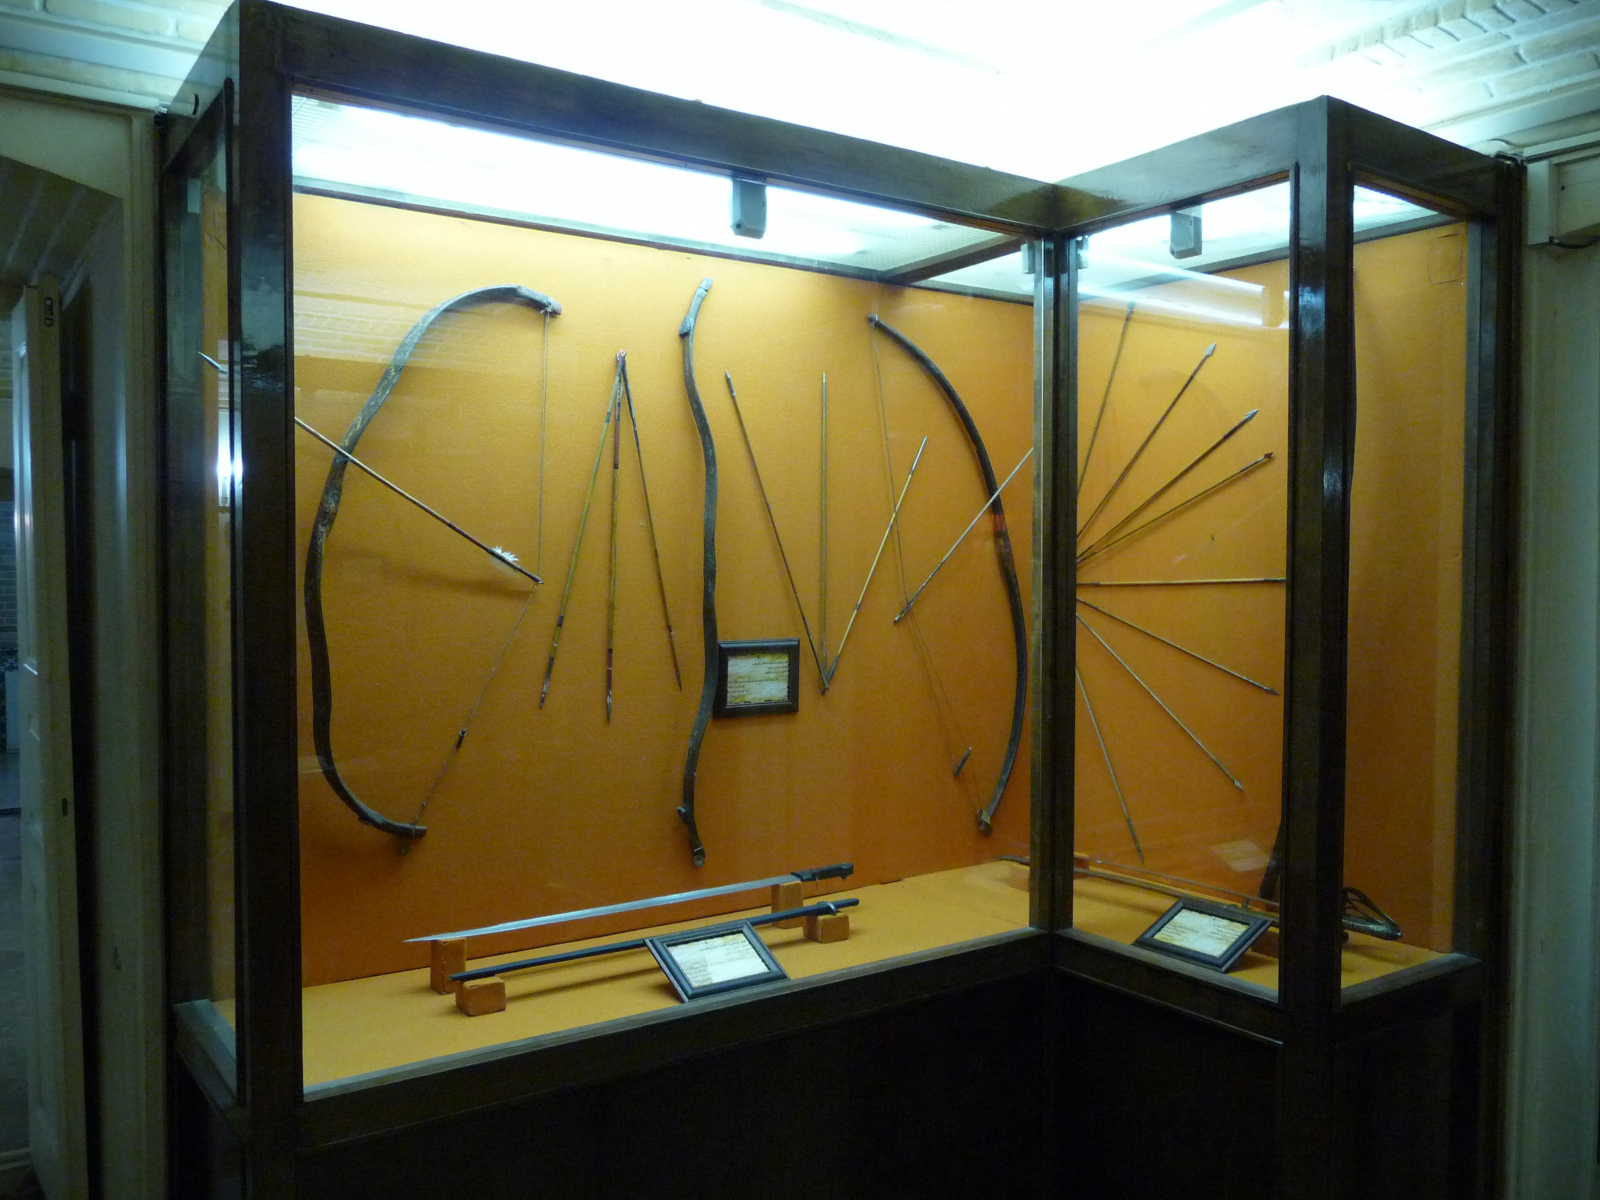 Baq-e Afifabad - Museum - Ceremonial Bows Arrows